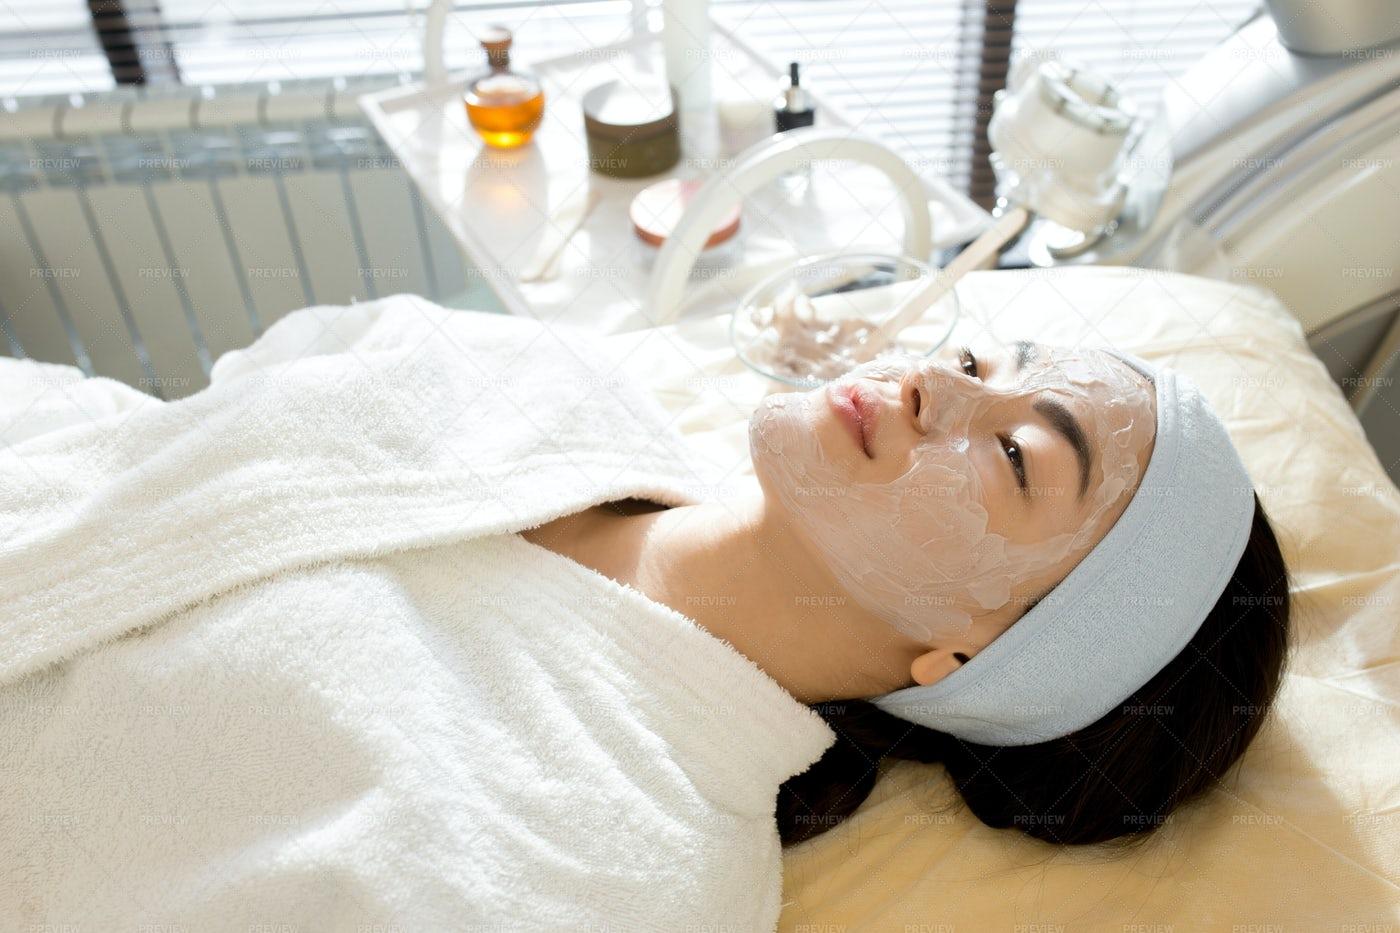 Asian Woman Enjoying SPA Treatment: Stock Photos